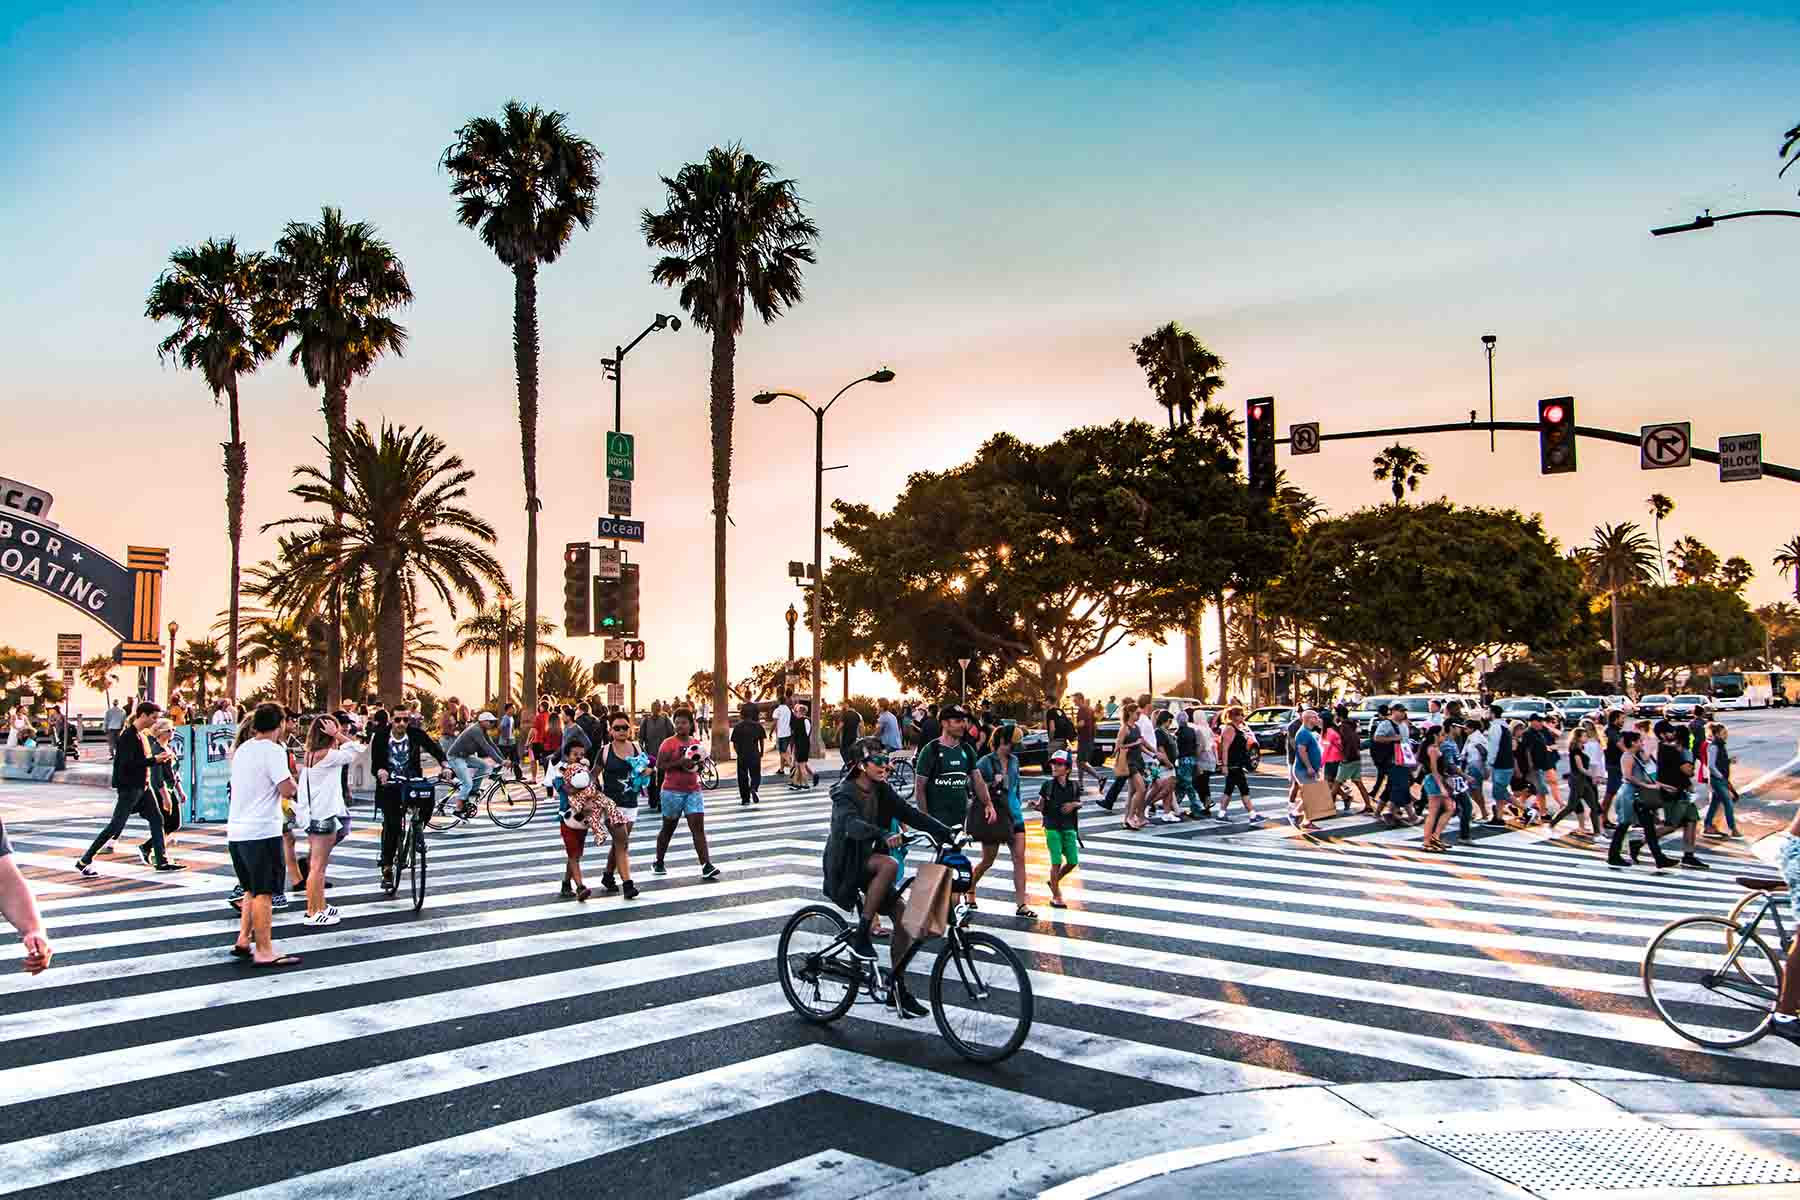 An crosswalk on Santa Monica Boulevard